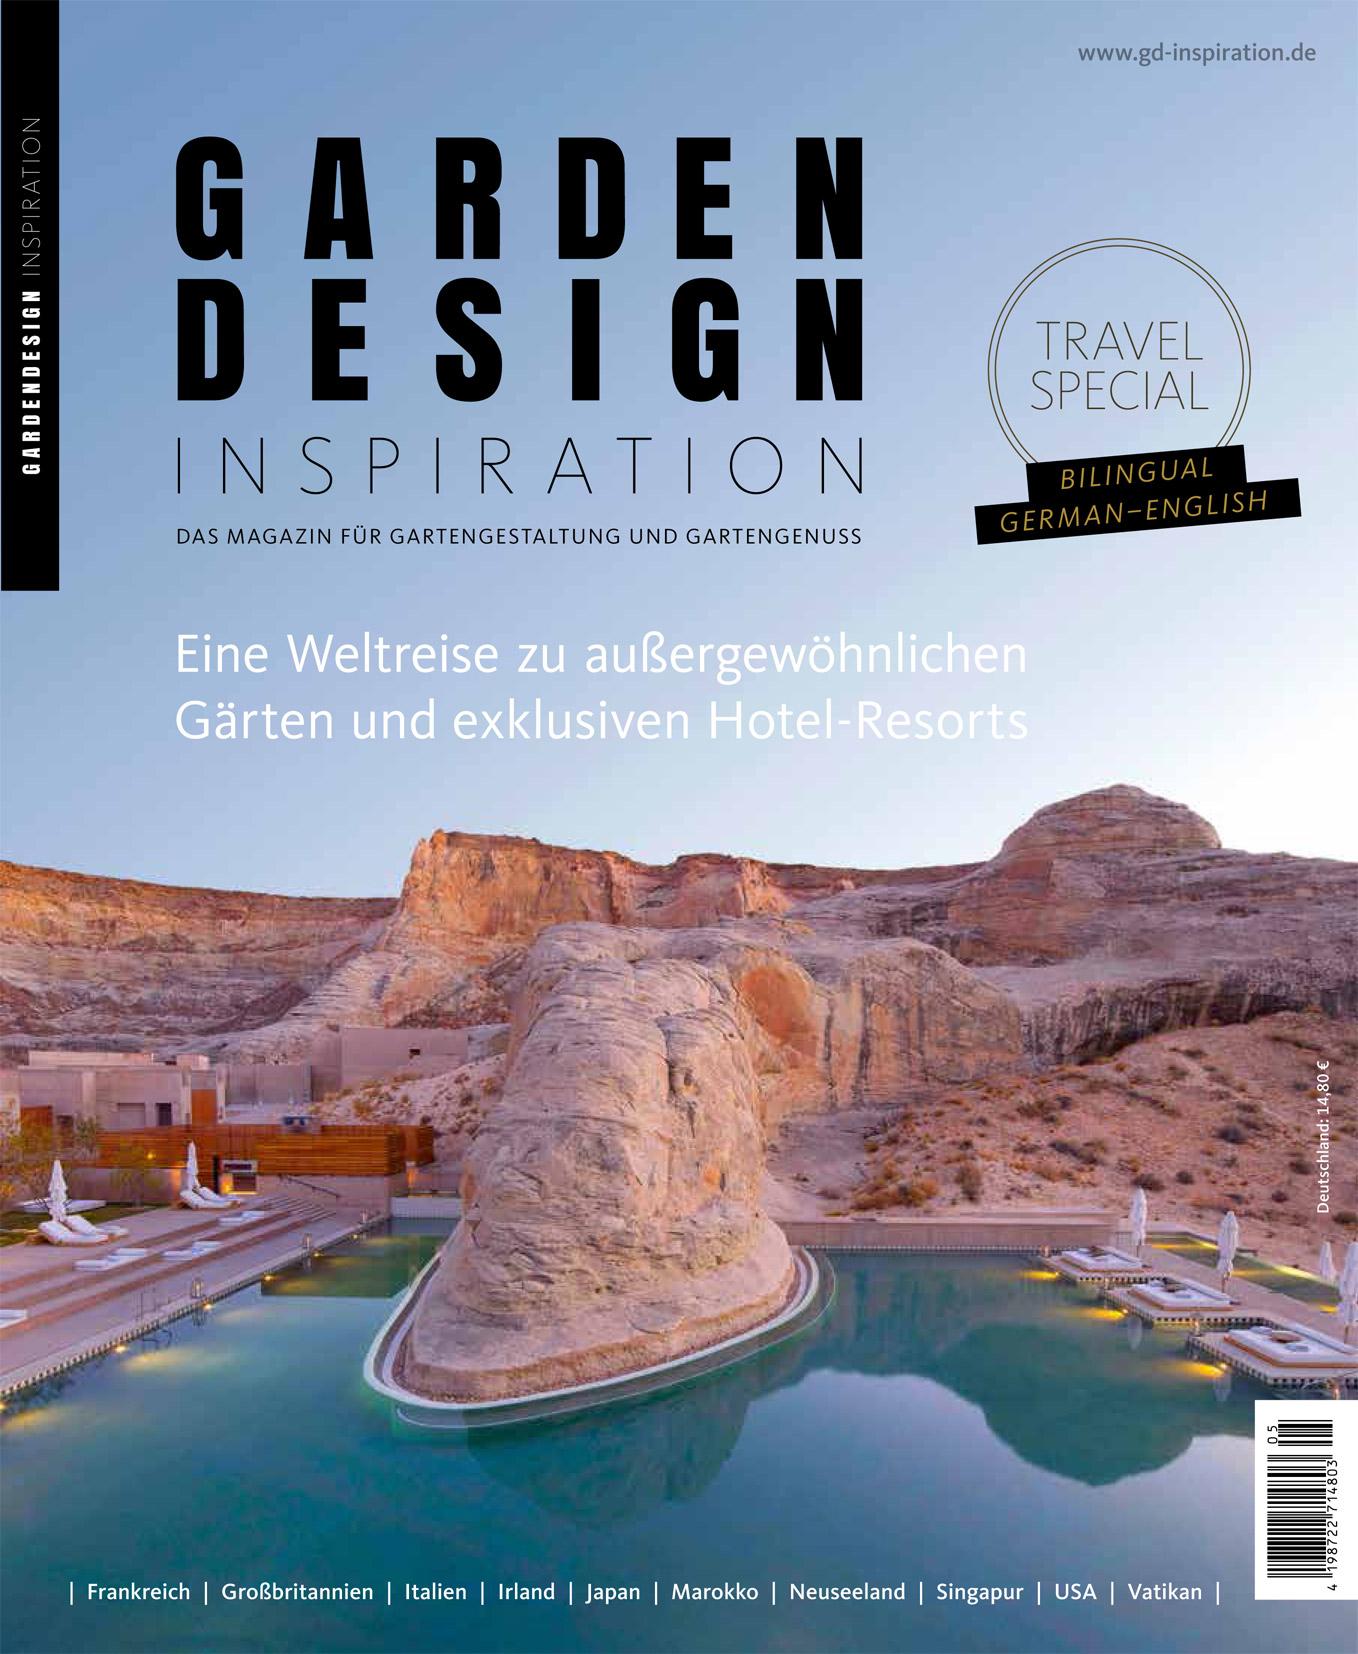 GD-Magazin_Reise2016_Ritz_Page_1